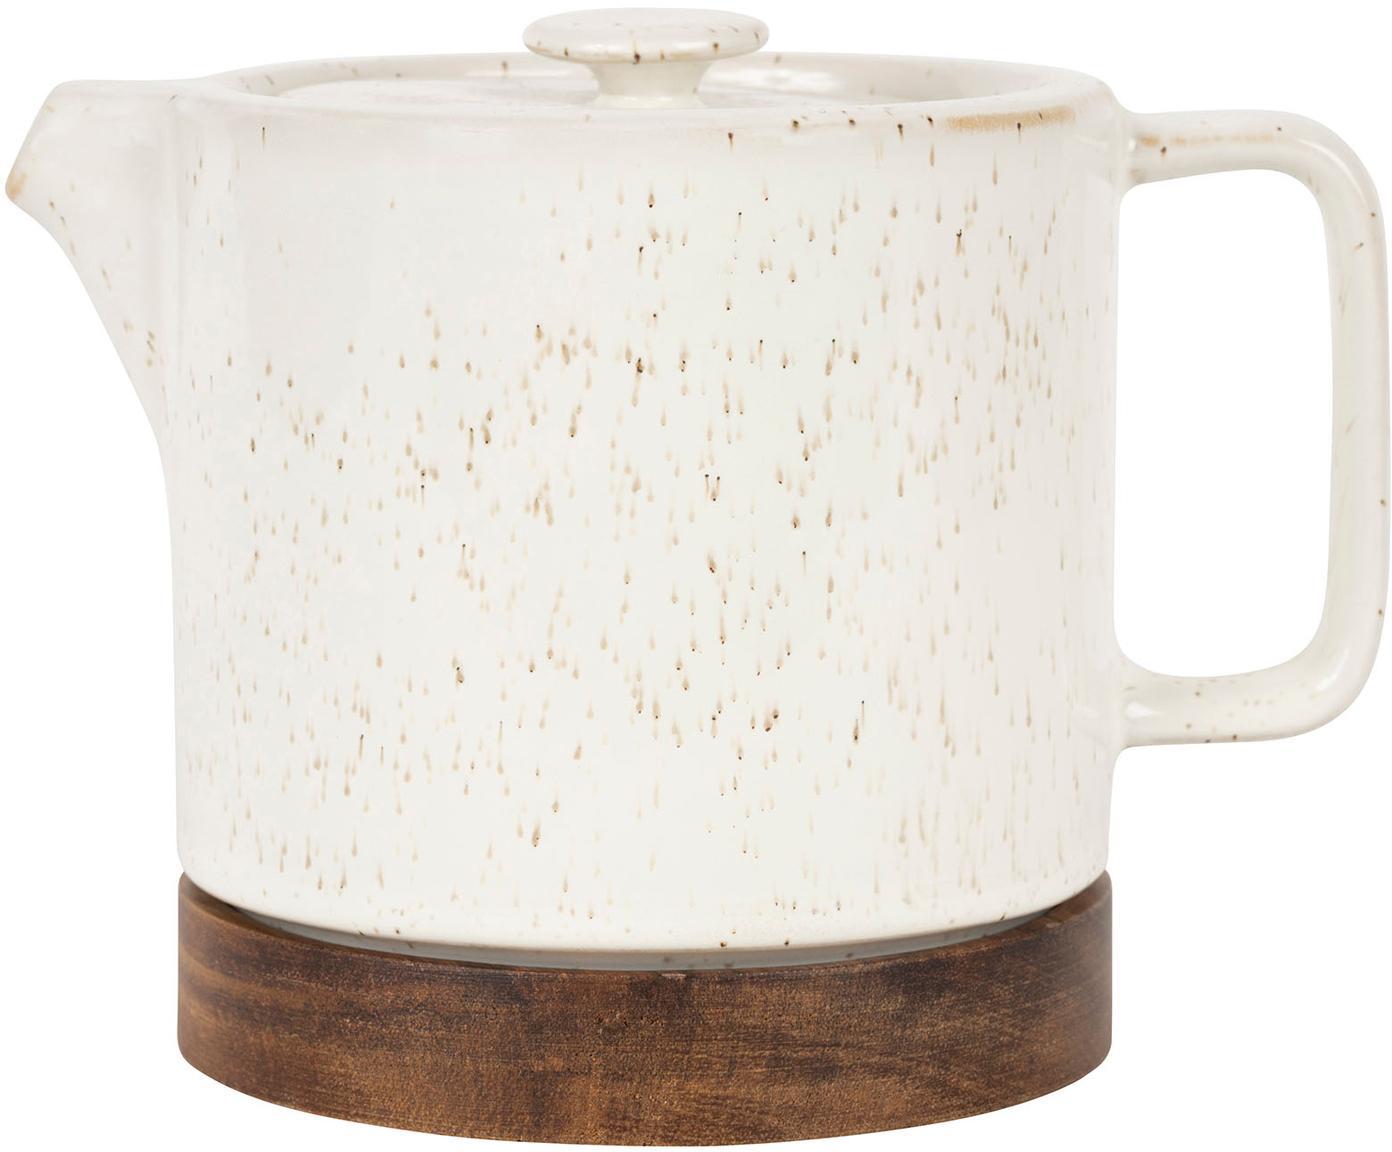 Tetera Nordika, Gres, madera de acacia, Blanco, fresno, Ø 12 x Al 12 cm